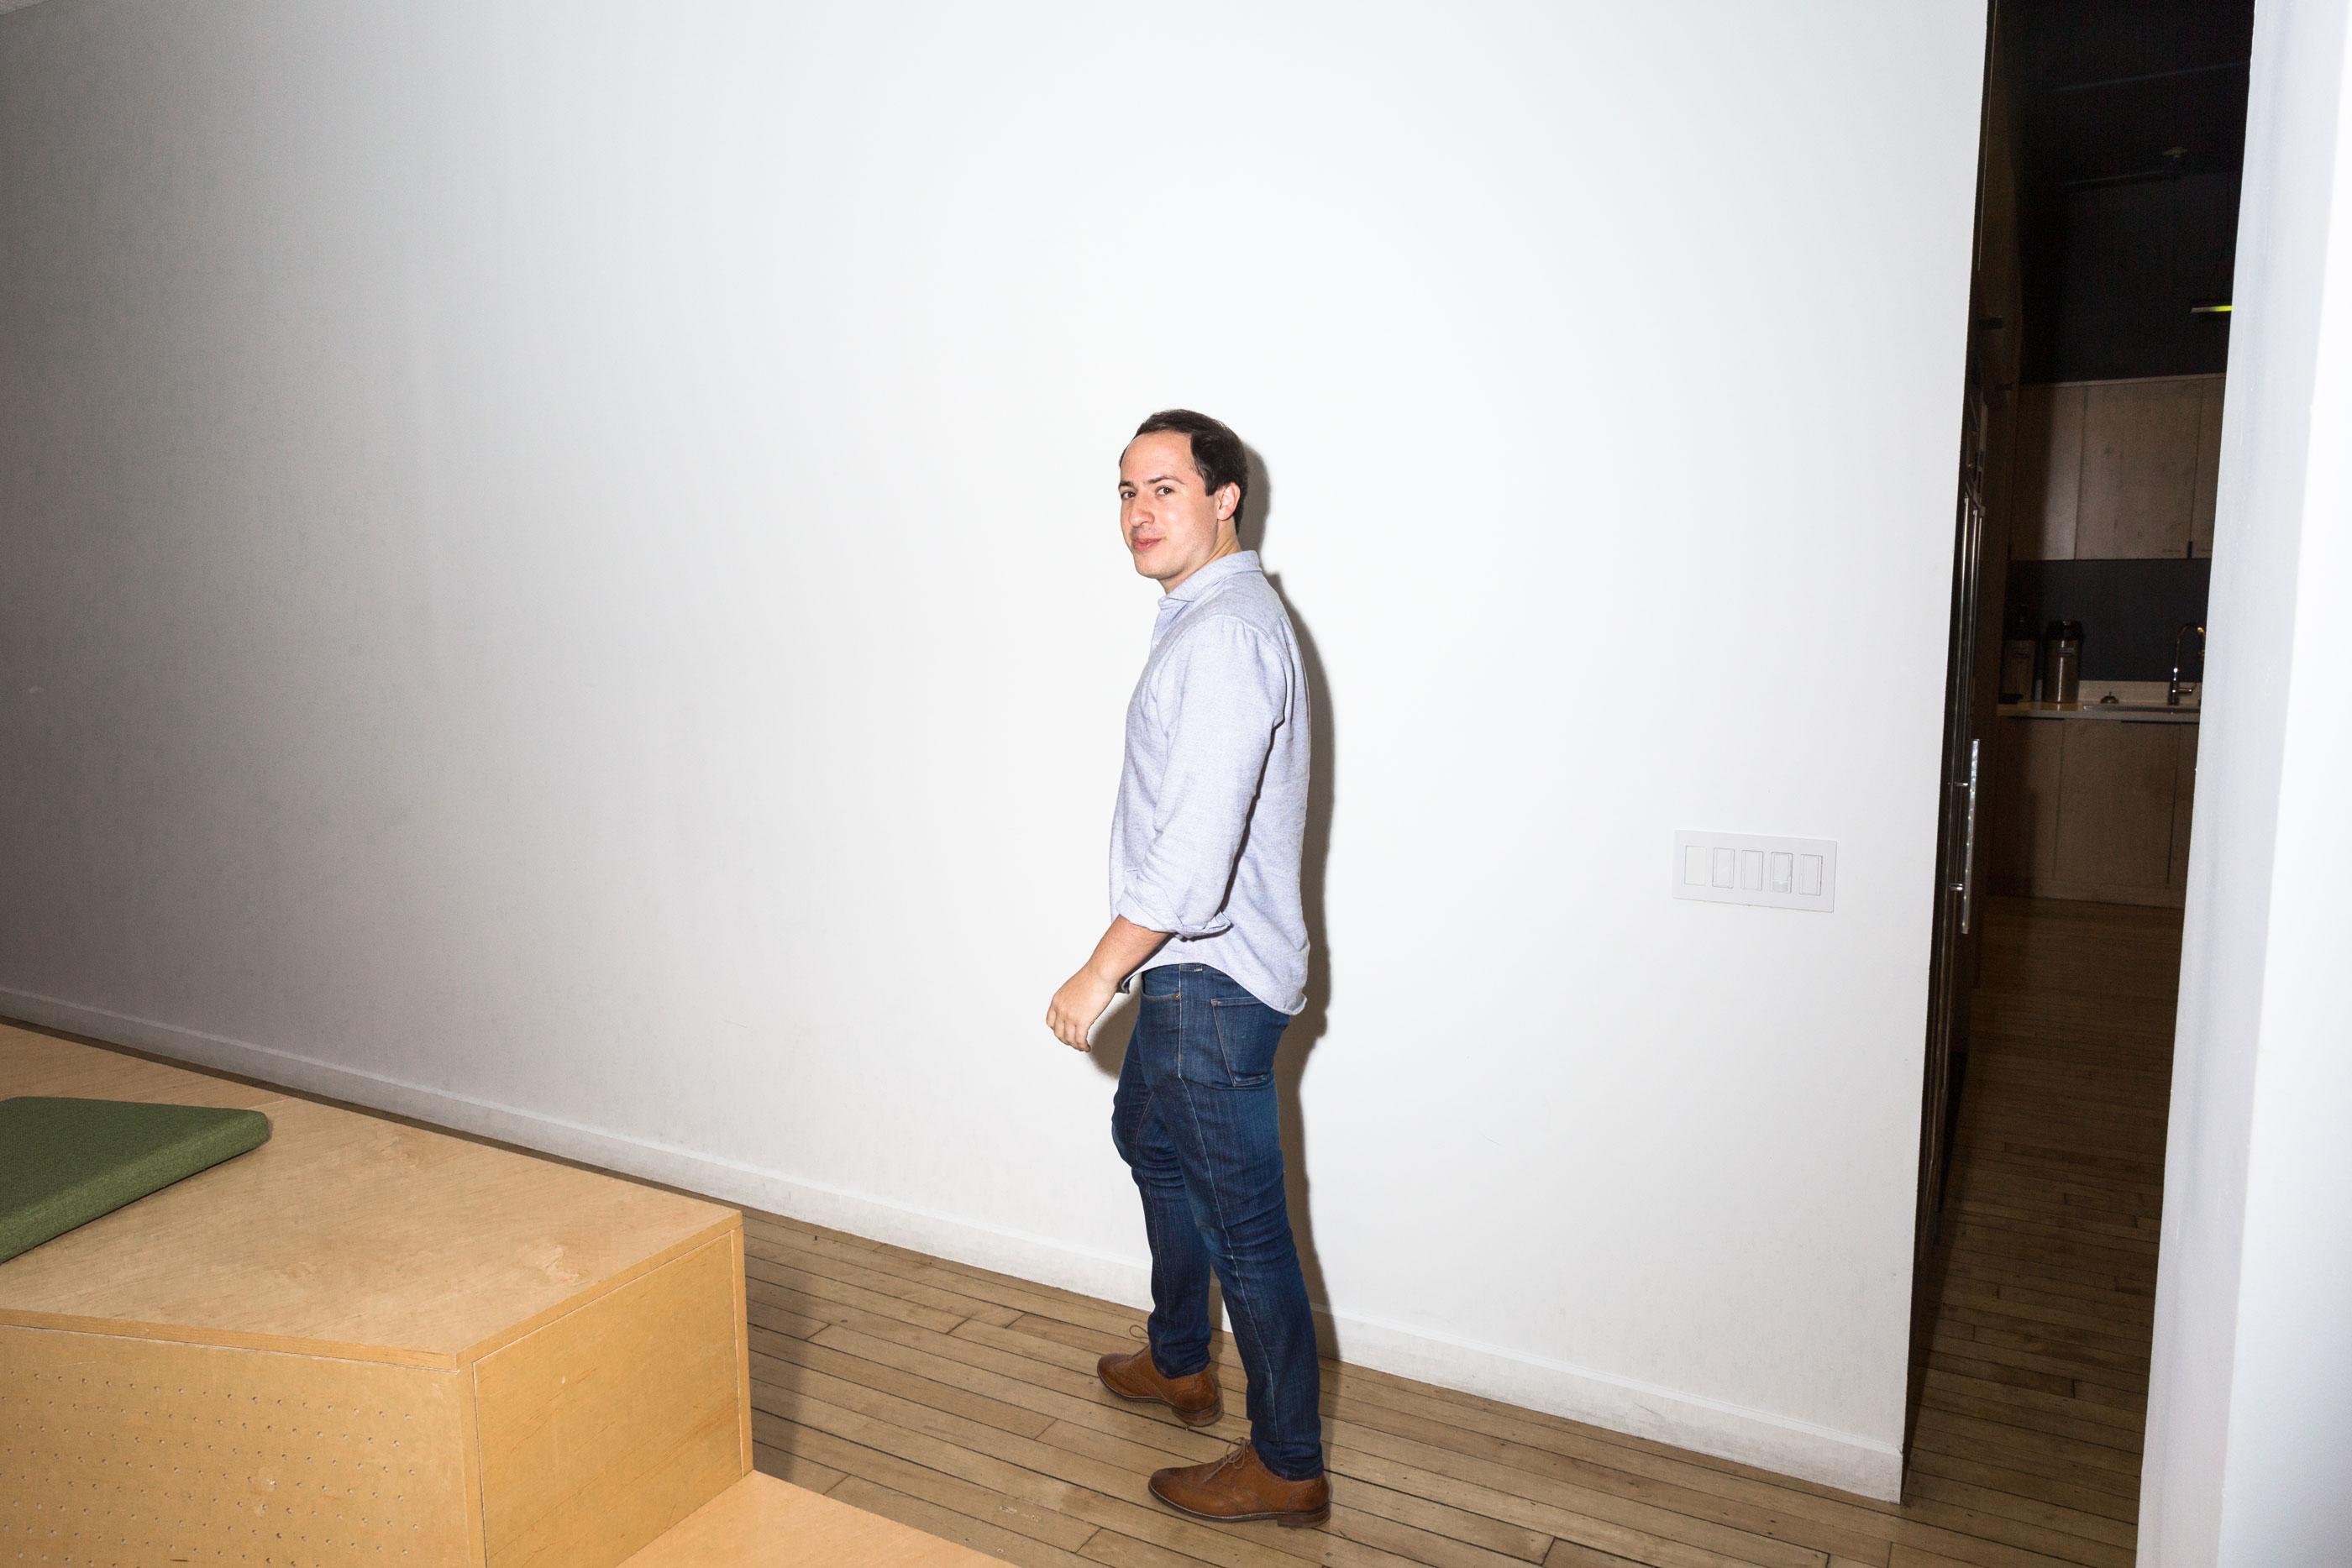 Noah Weiss es el jefe del equipo de IA de Slack, el grupo de Búsqueda, Aprendizaje e Inteligencia.